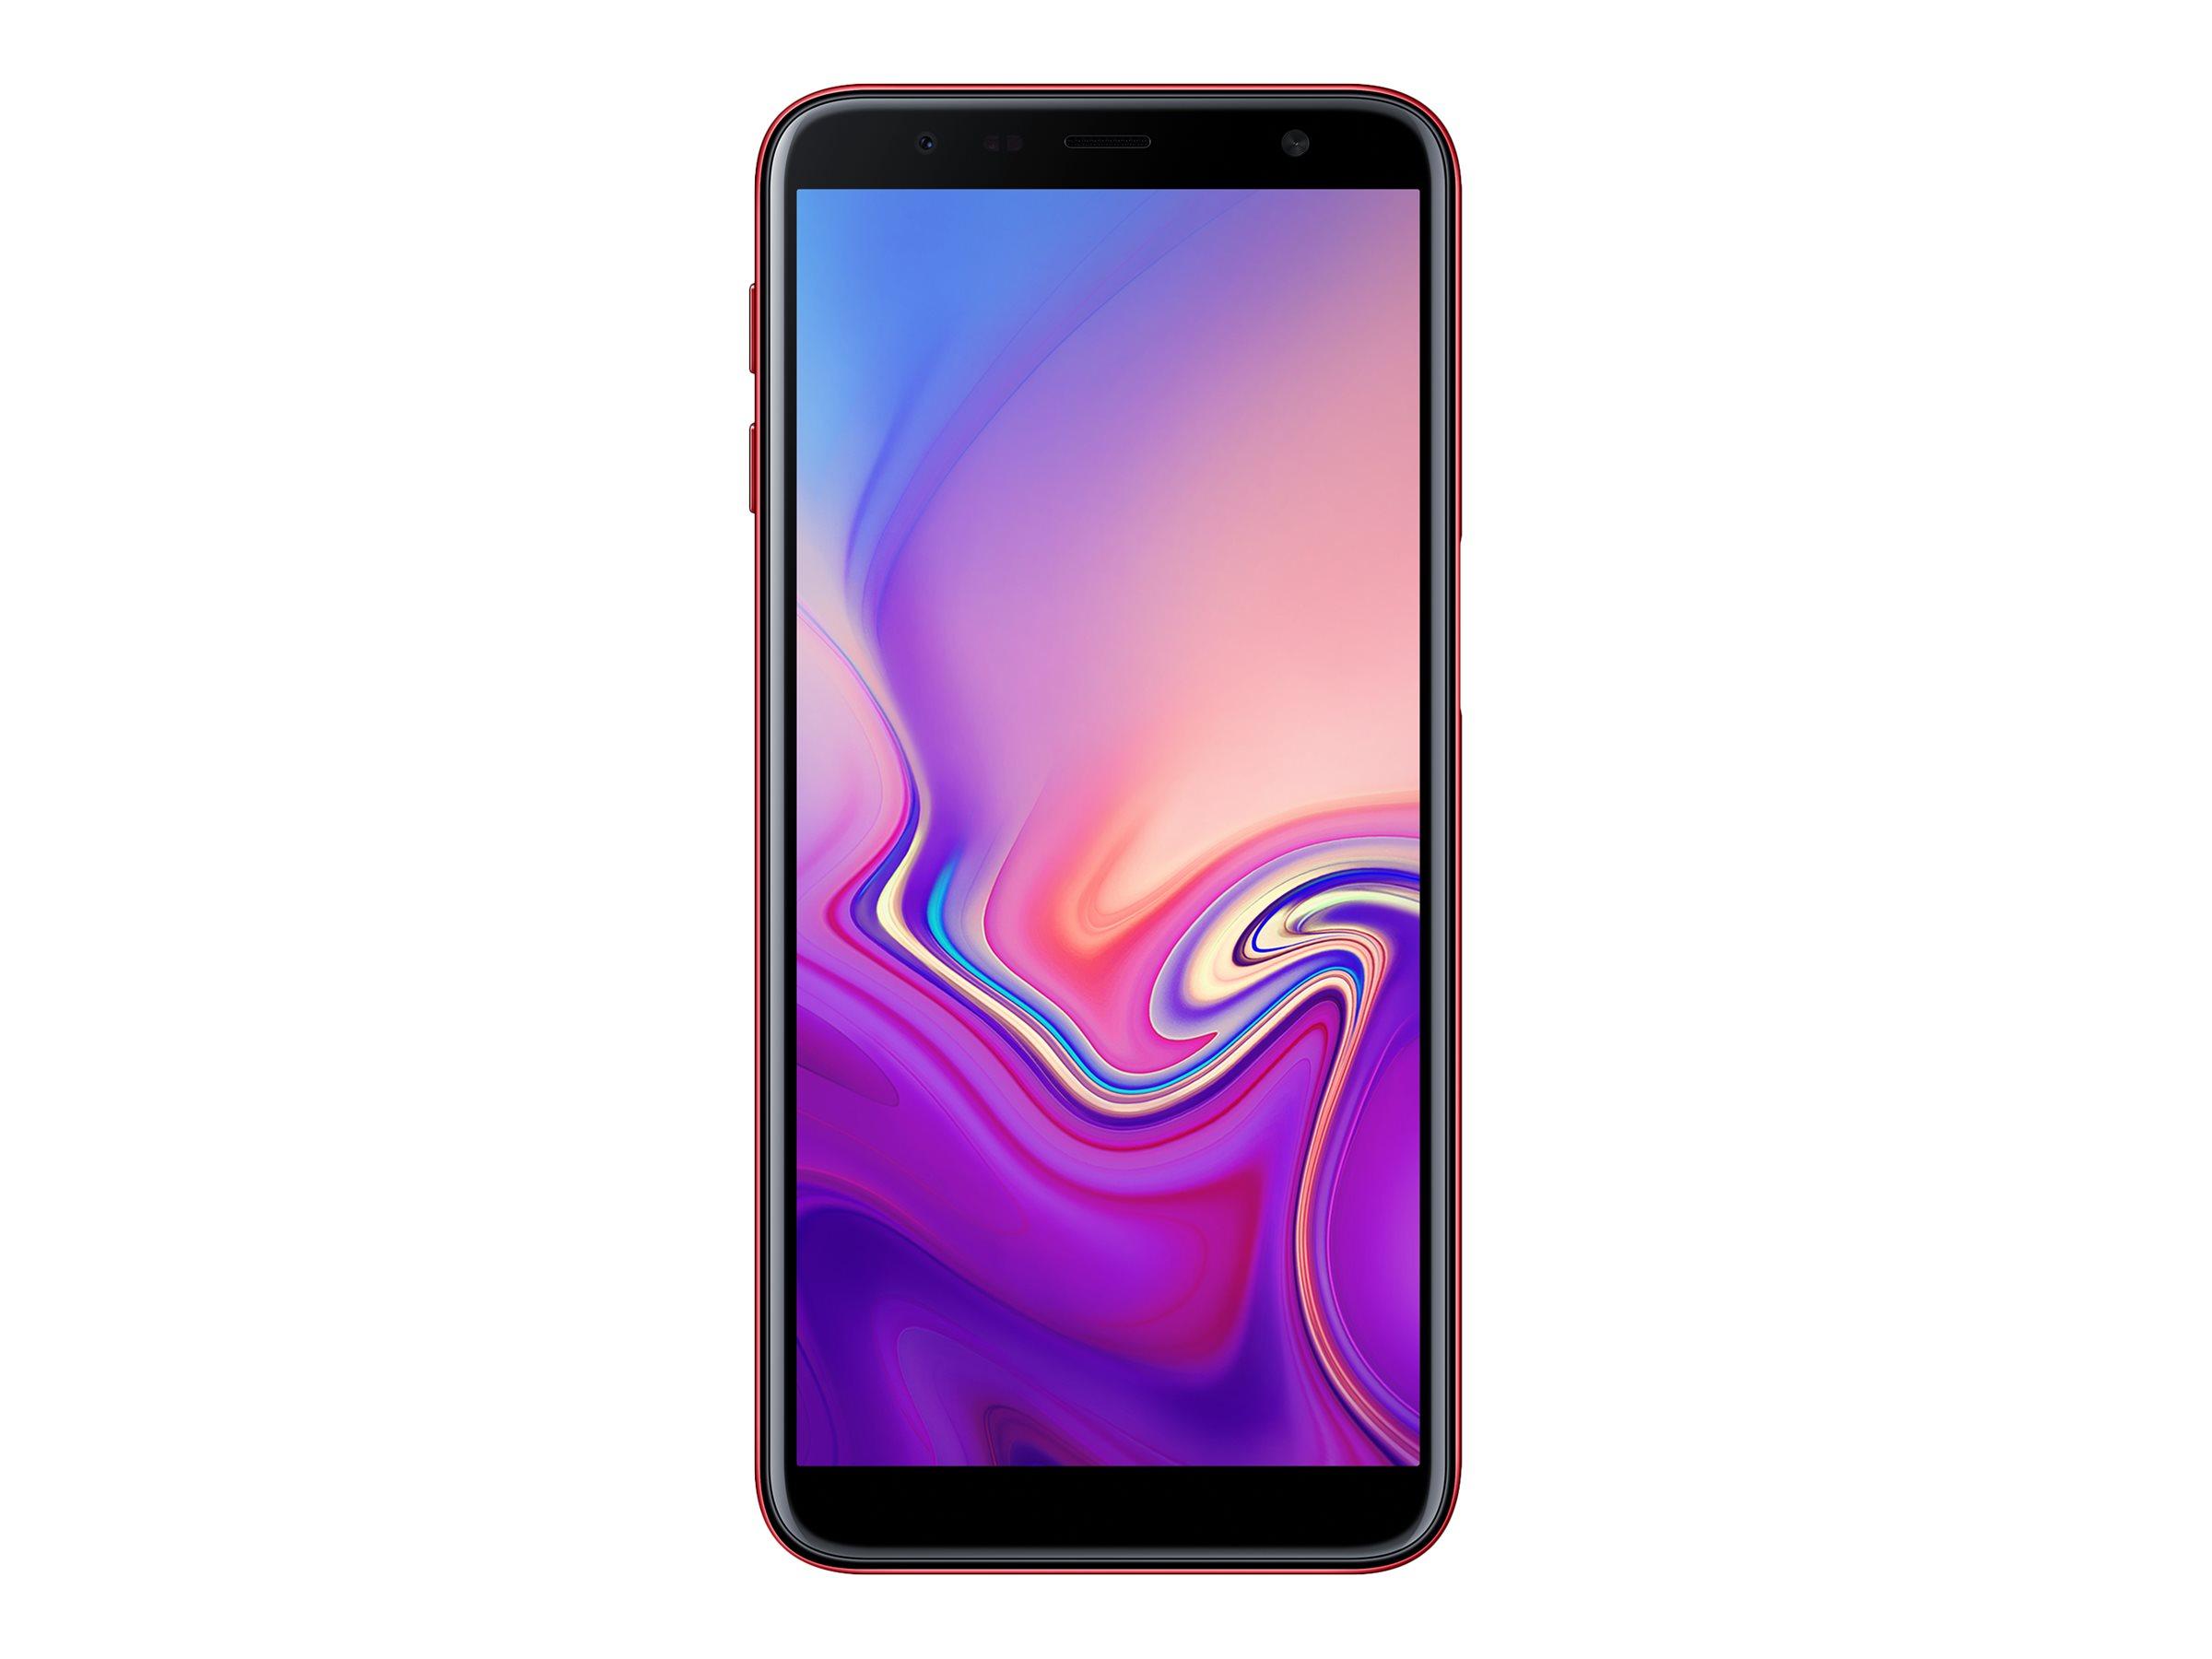 Samsung Galaxy J6+ - rouge - 4G HSPA+ - 32 Go - GSM - smartphone